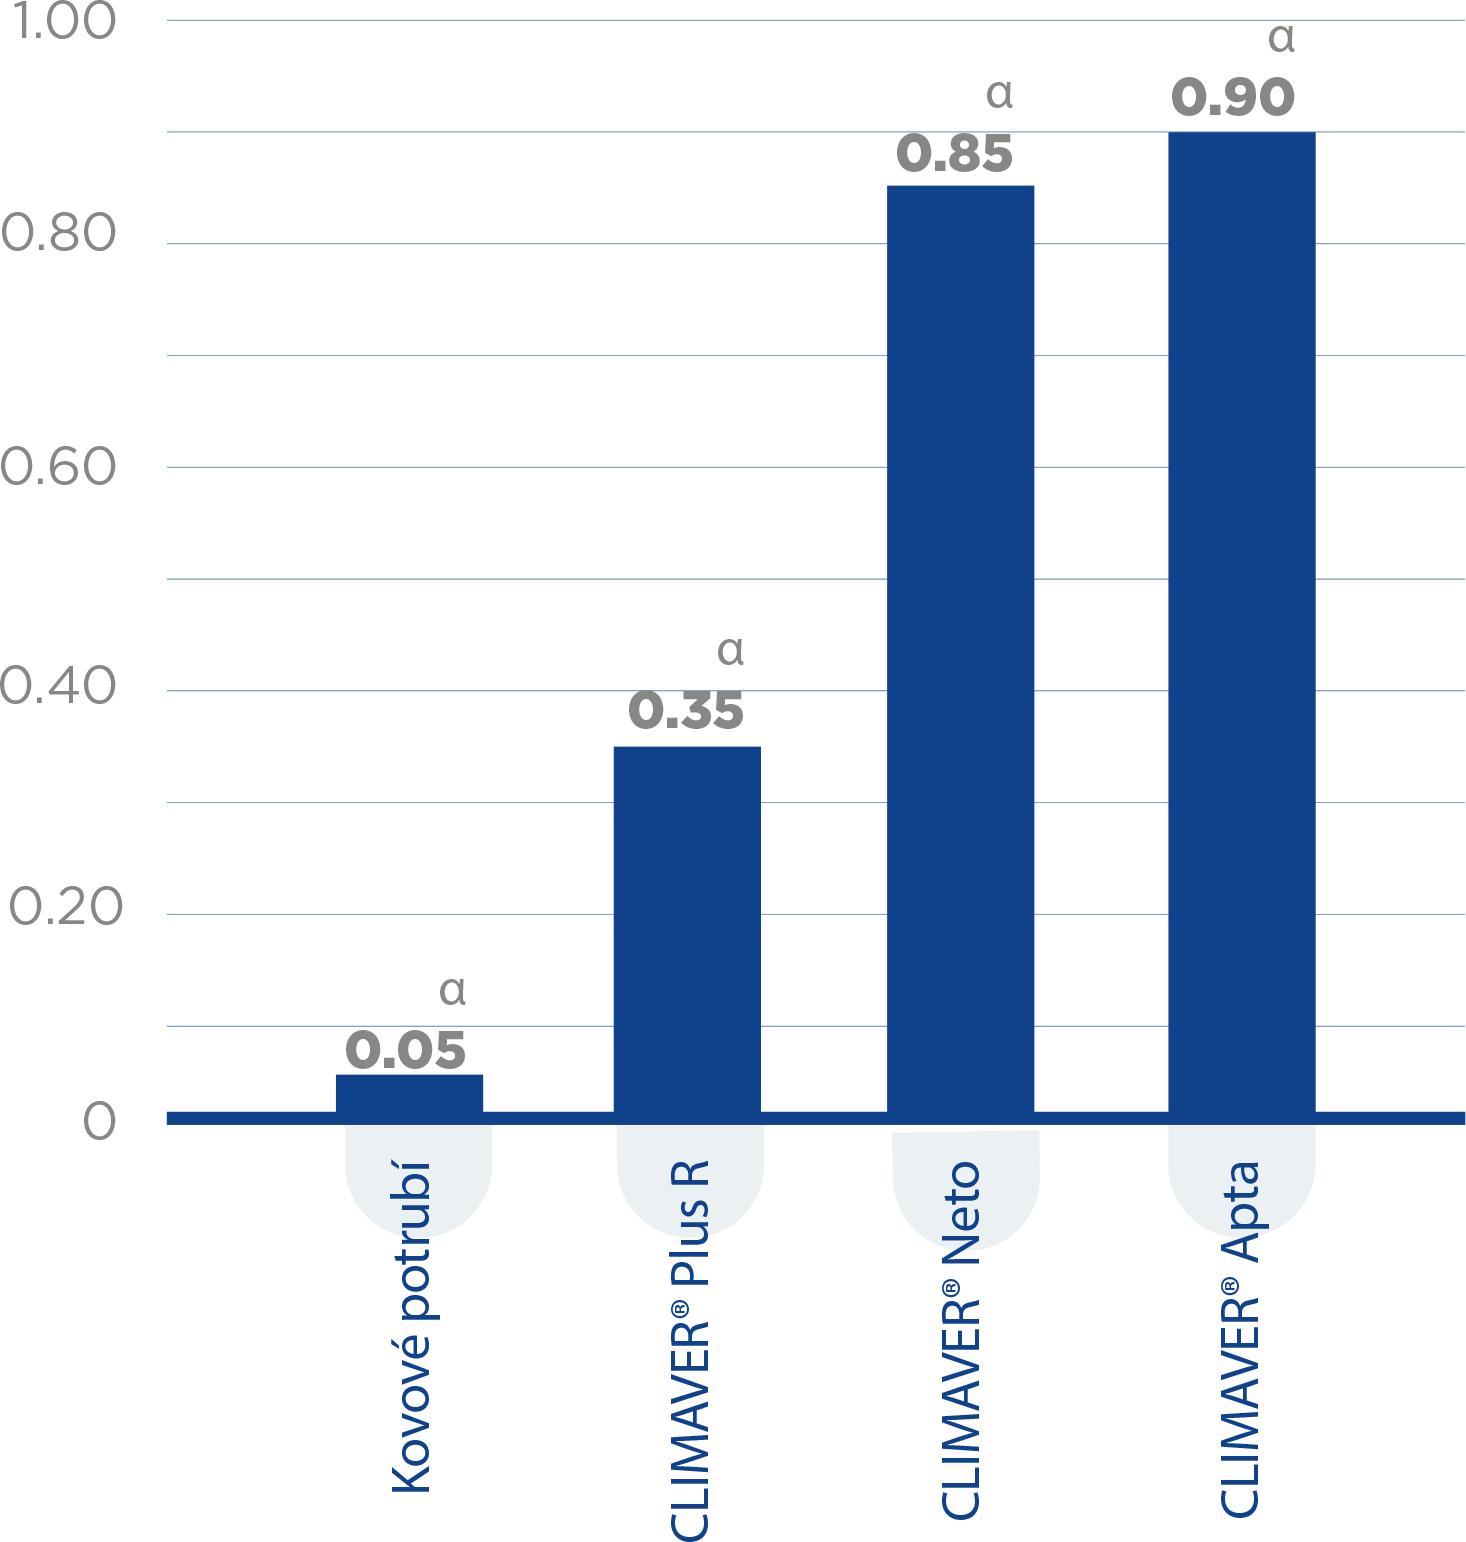 graf Pohltivost zvuku (αw)